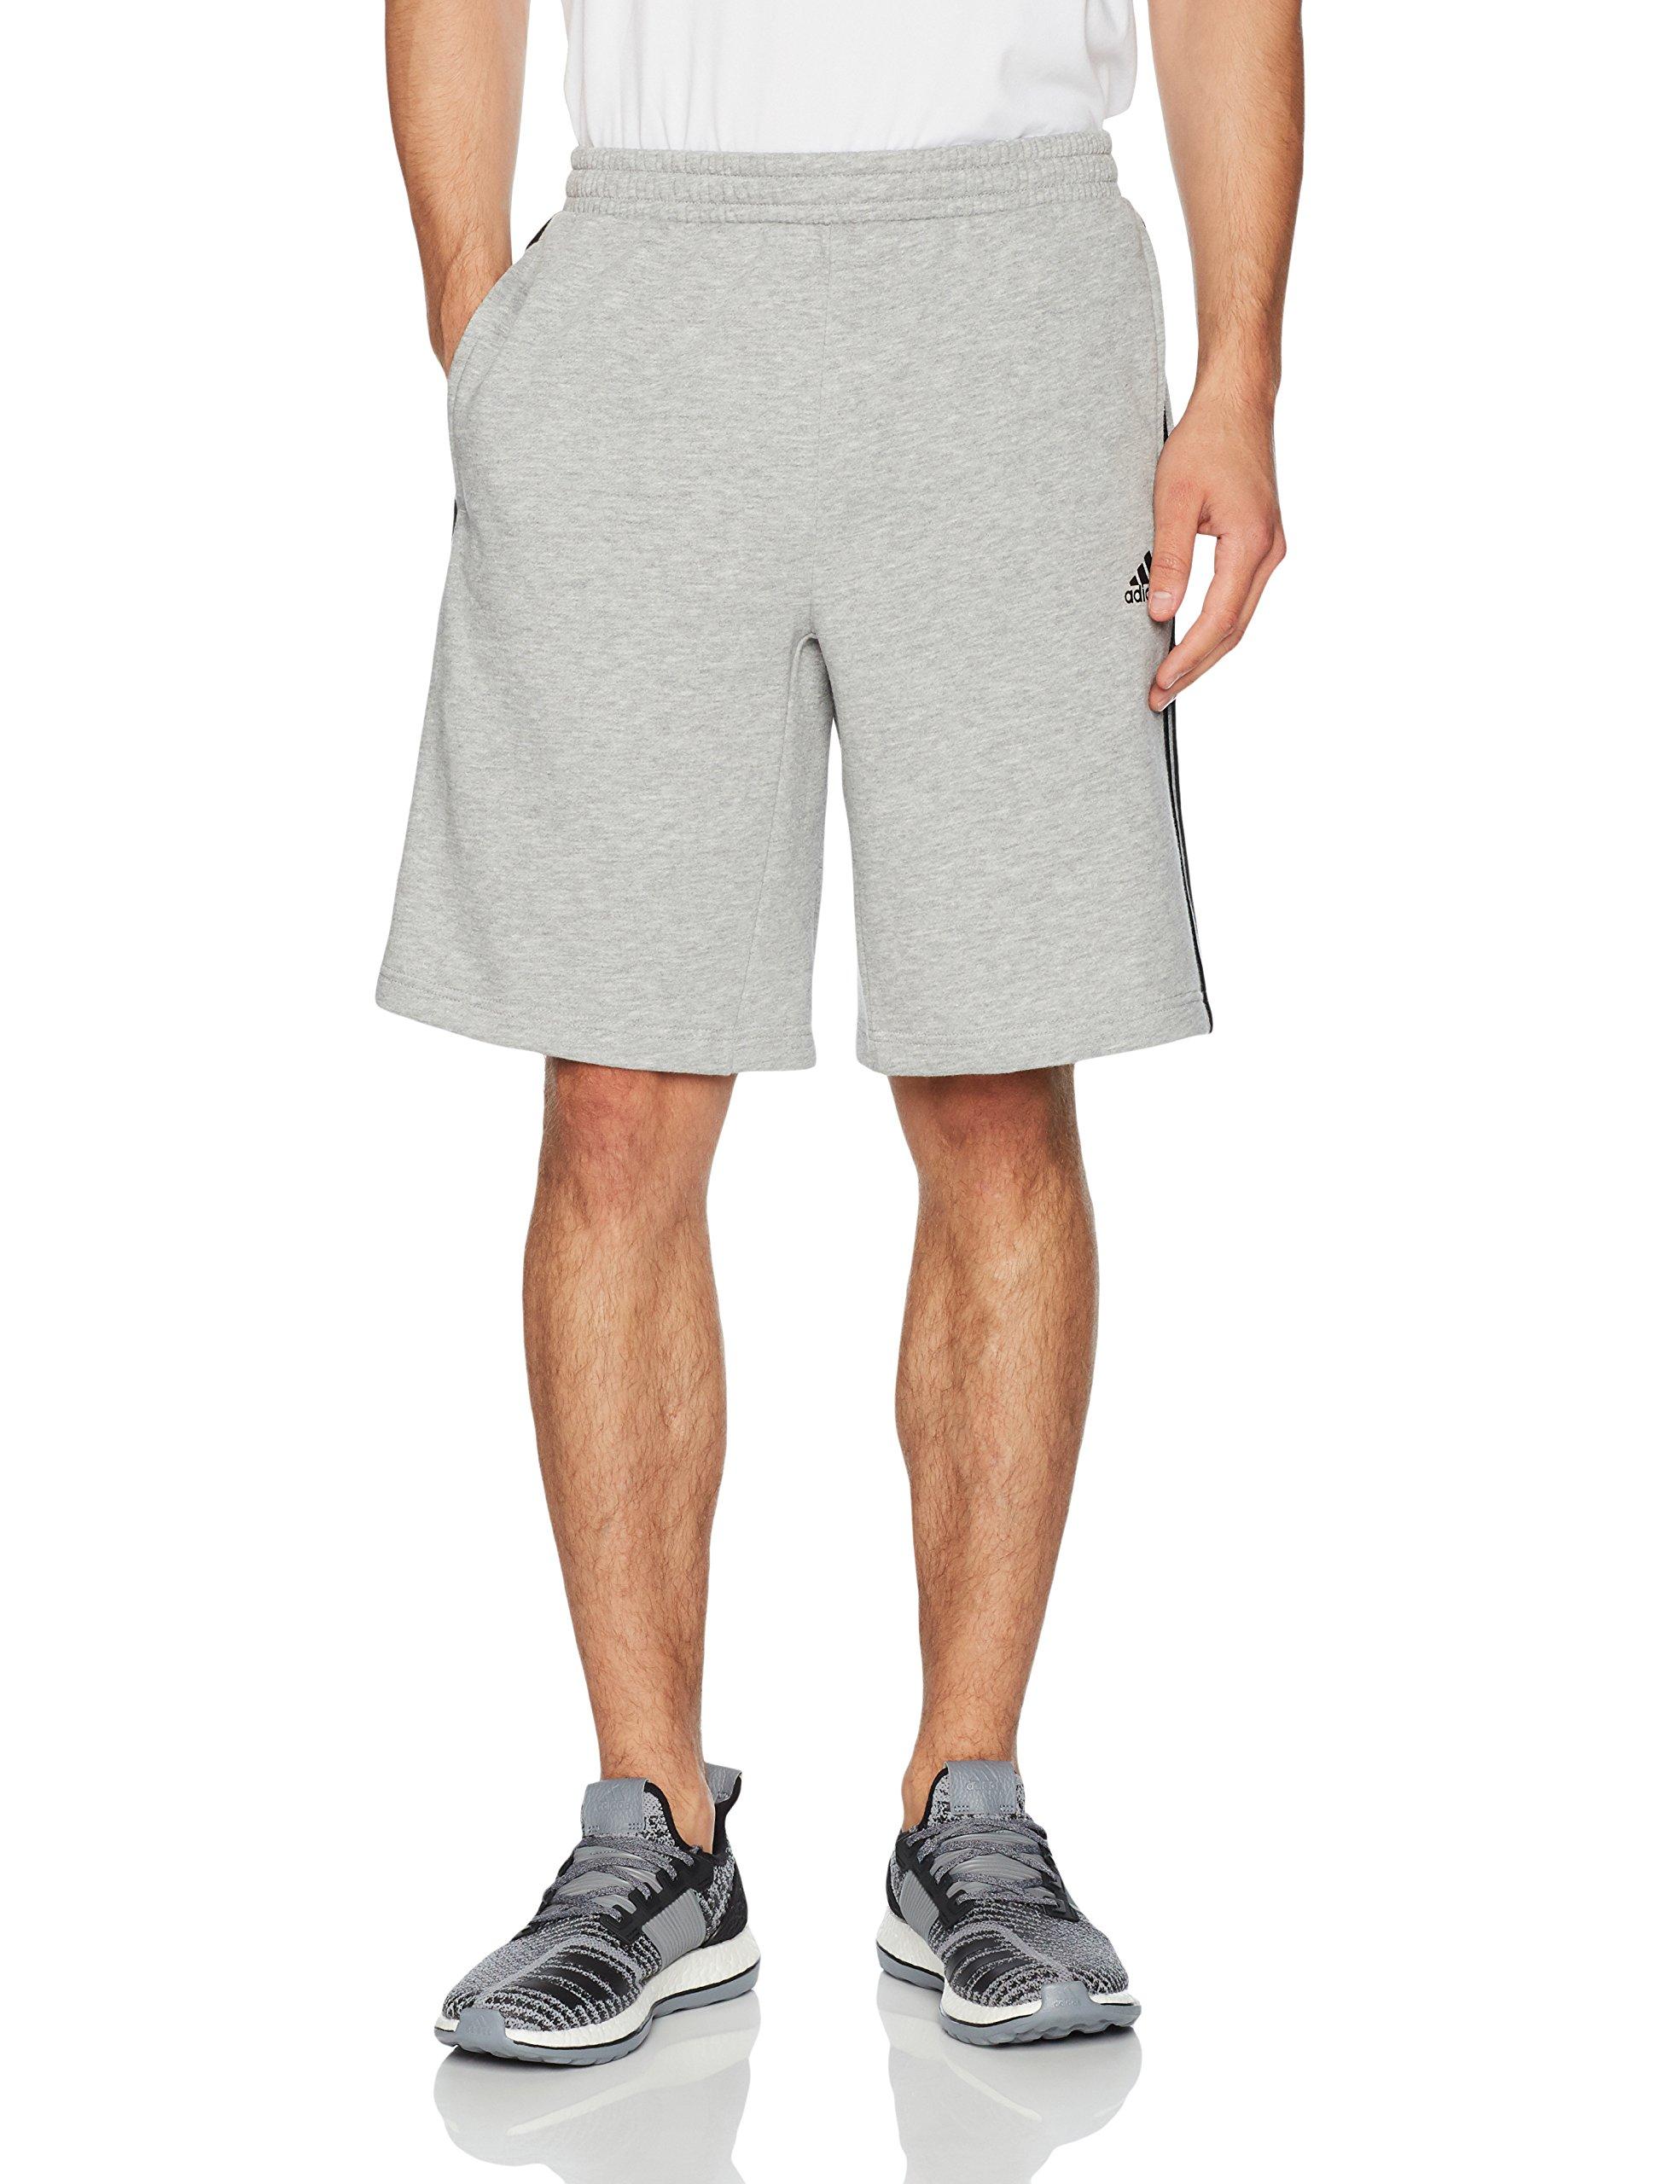 adidas Men's Athletics Essential Cotton Shorts, Medium Grey Heather/Black, XX-Large by adidas